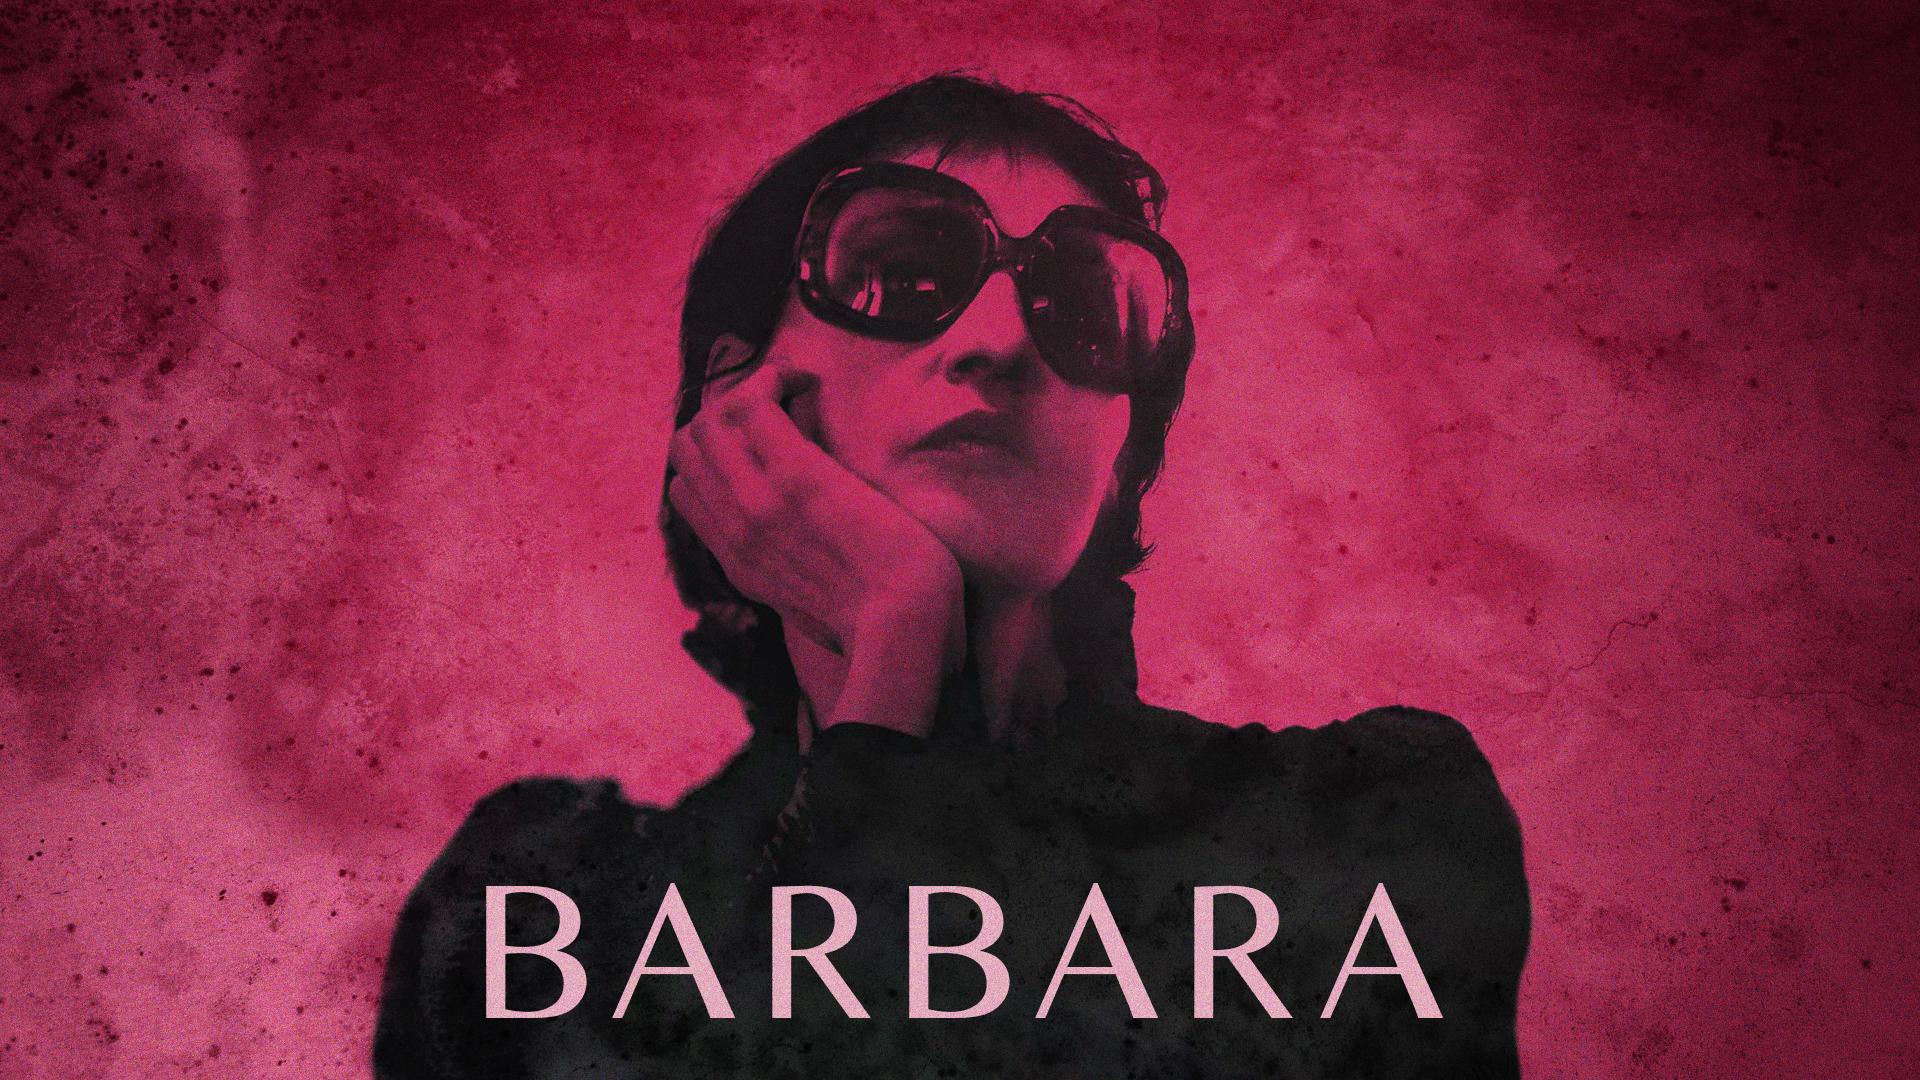 001 Barbara